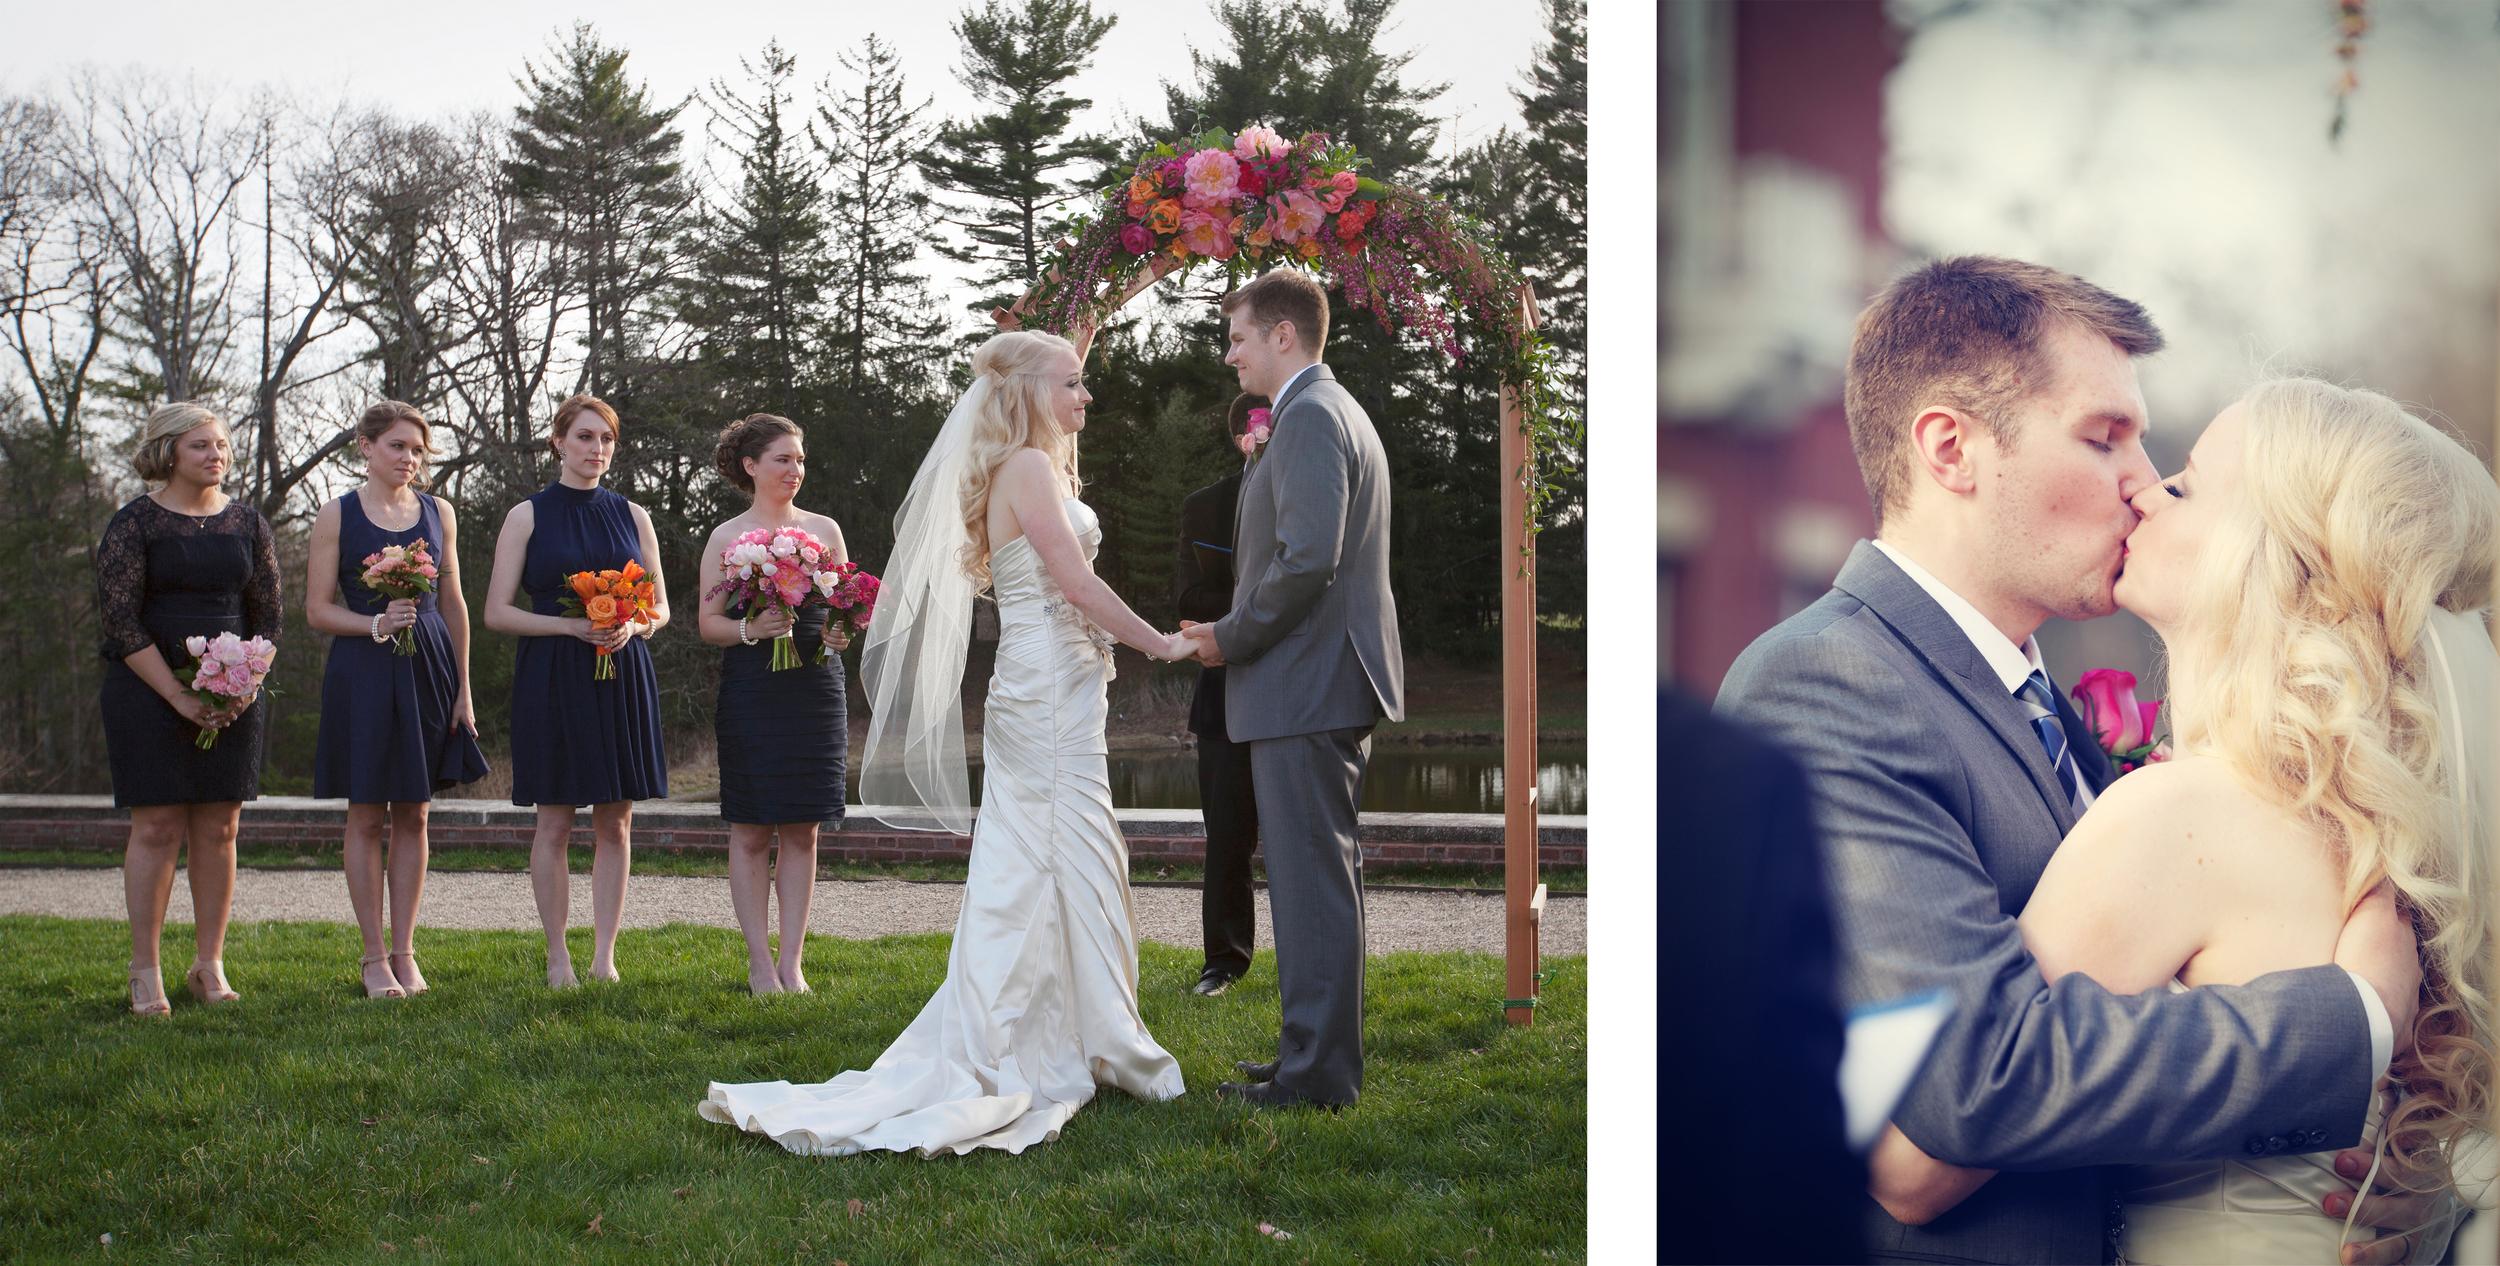 wedding_ceremony_kiss.jpg